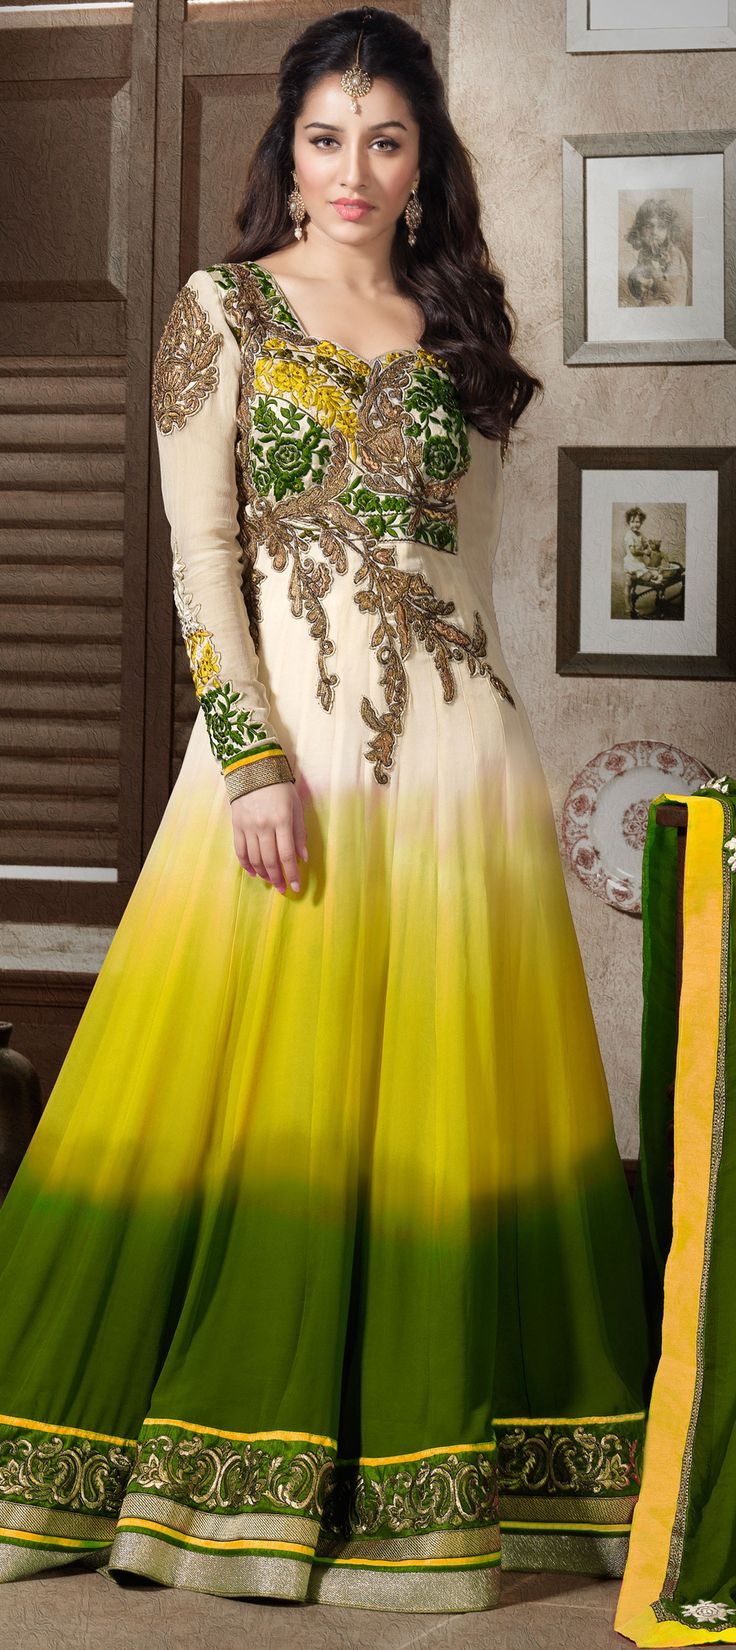 421712: #shraddhaKapoor #Ombre #Bollywood #Anarkali #mintcolors #onlineshopping #sale #Newyear #wedding #bridalwear